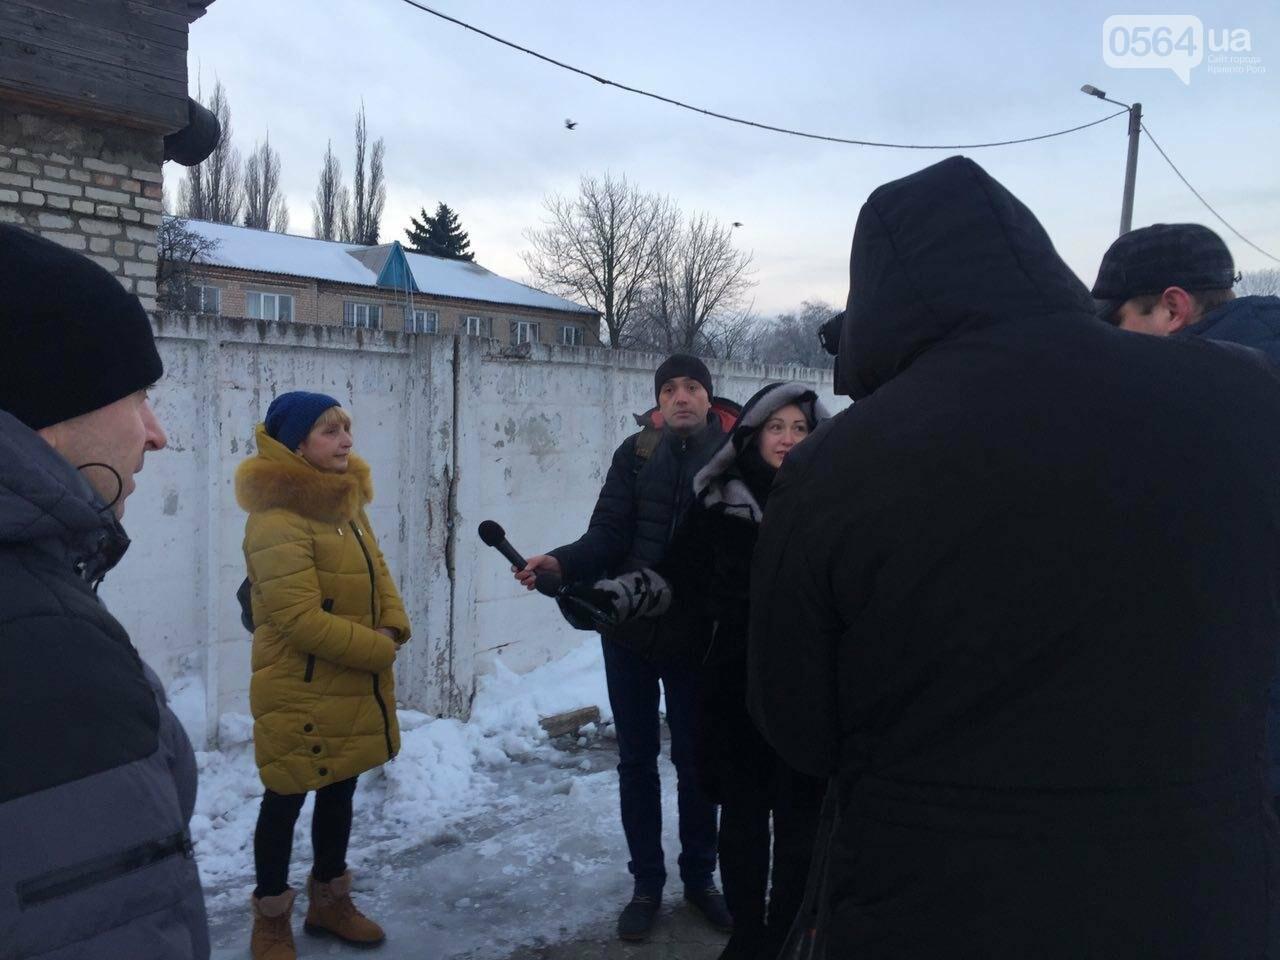 В Кривой Рог вернулся журналист Вячеслав Волк, тяжело раненый во время учений резервистов (ФОТО), фото-7